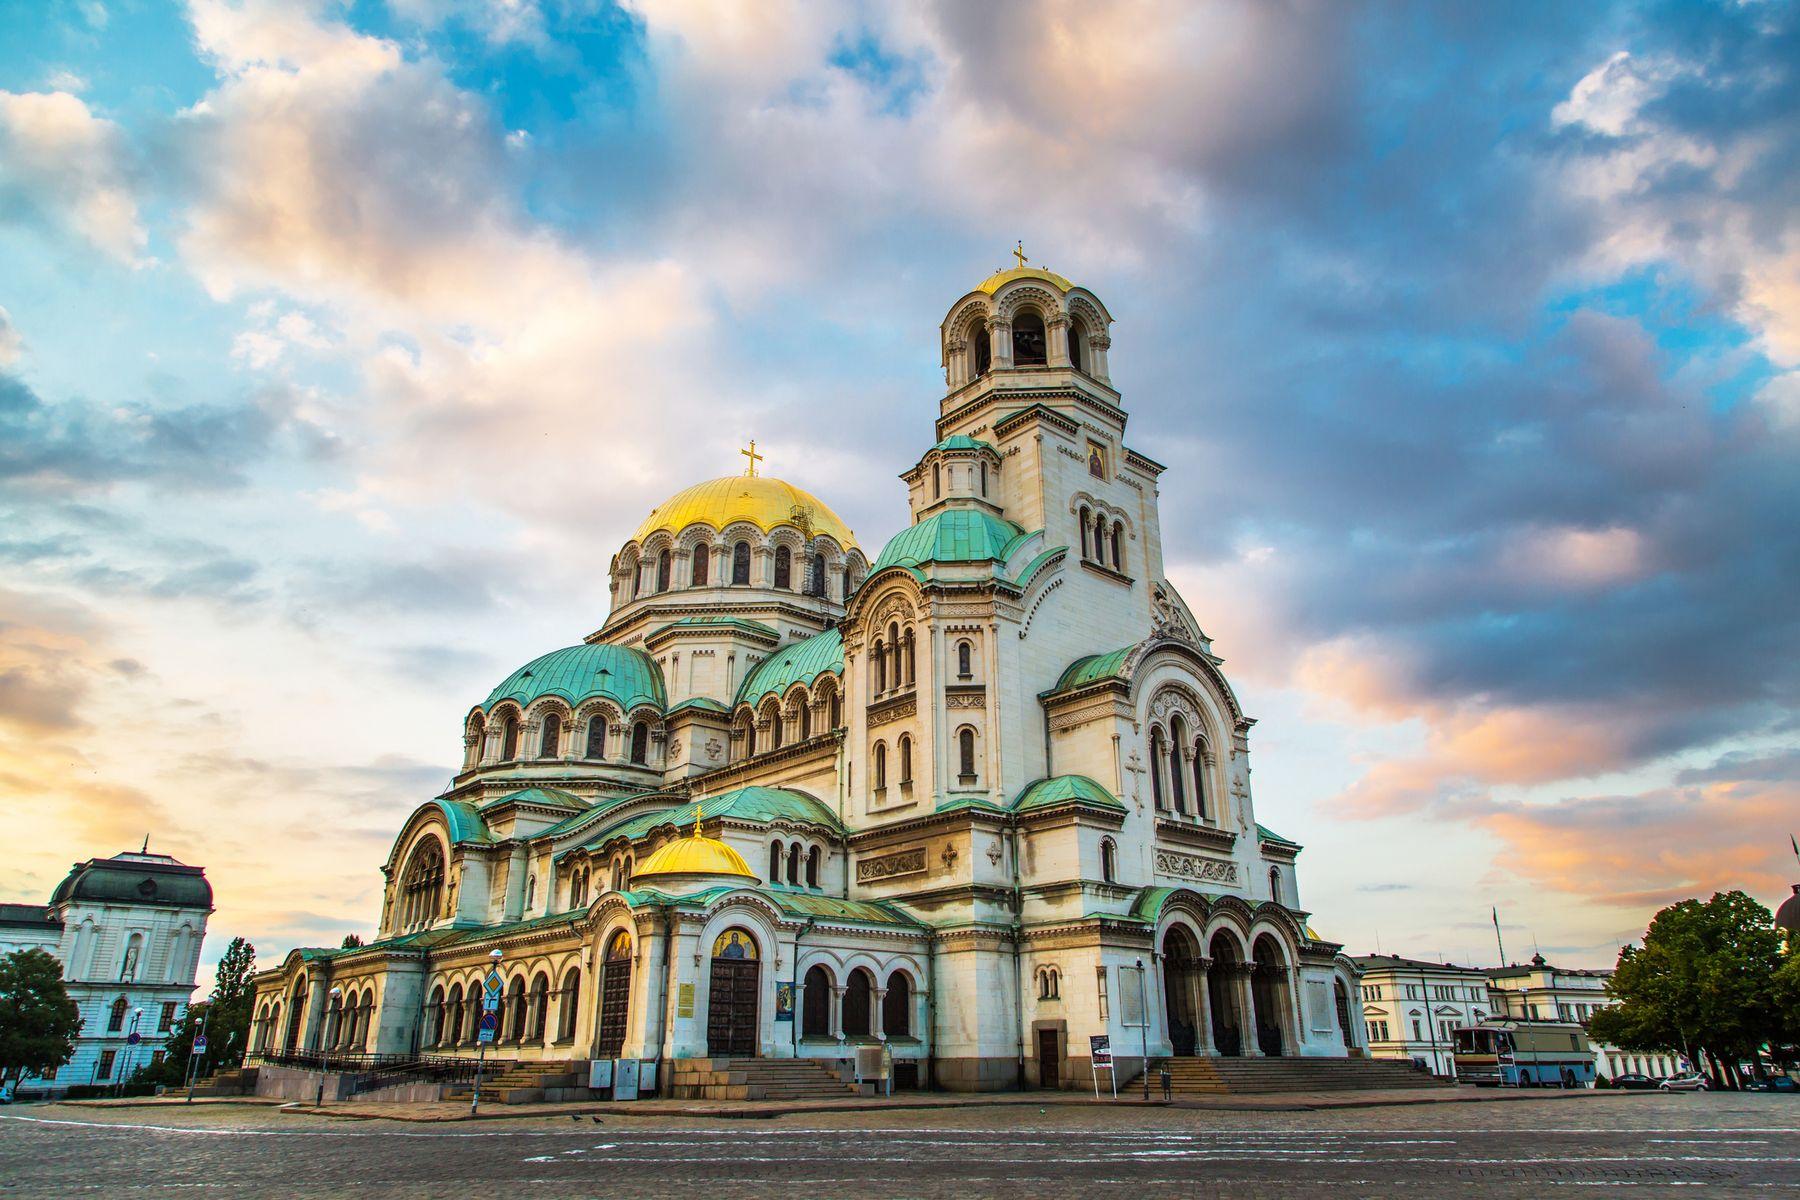 Alexander Newski Kathedrale in Sofia iStock 486604612